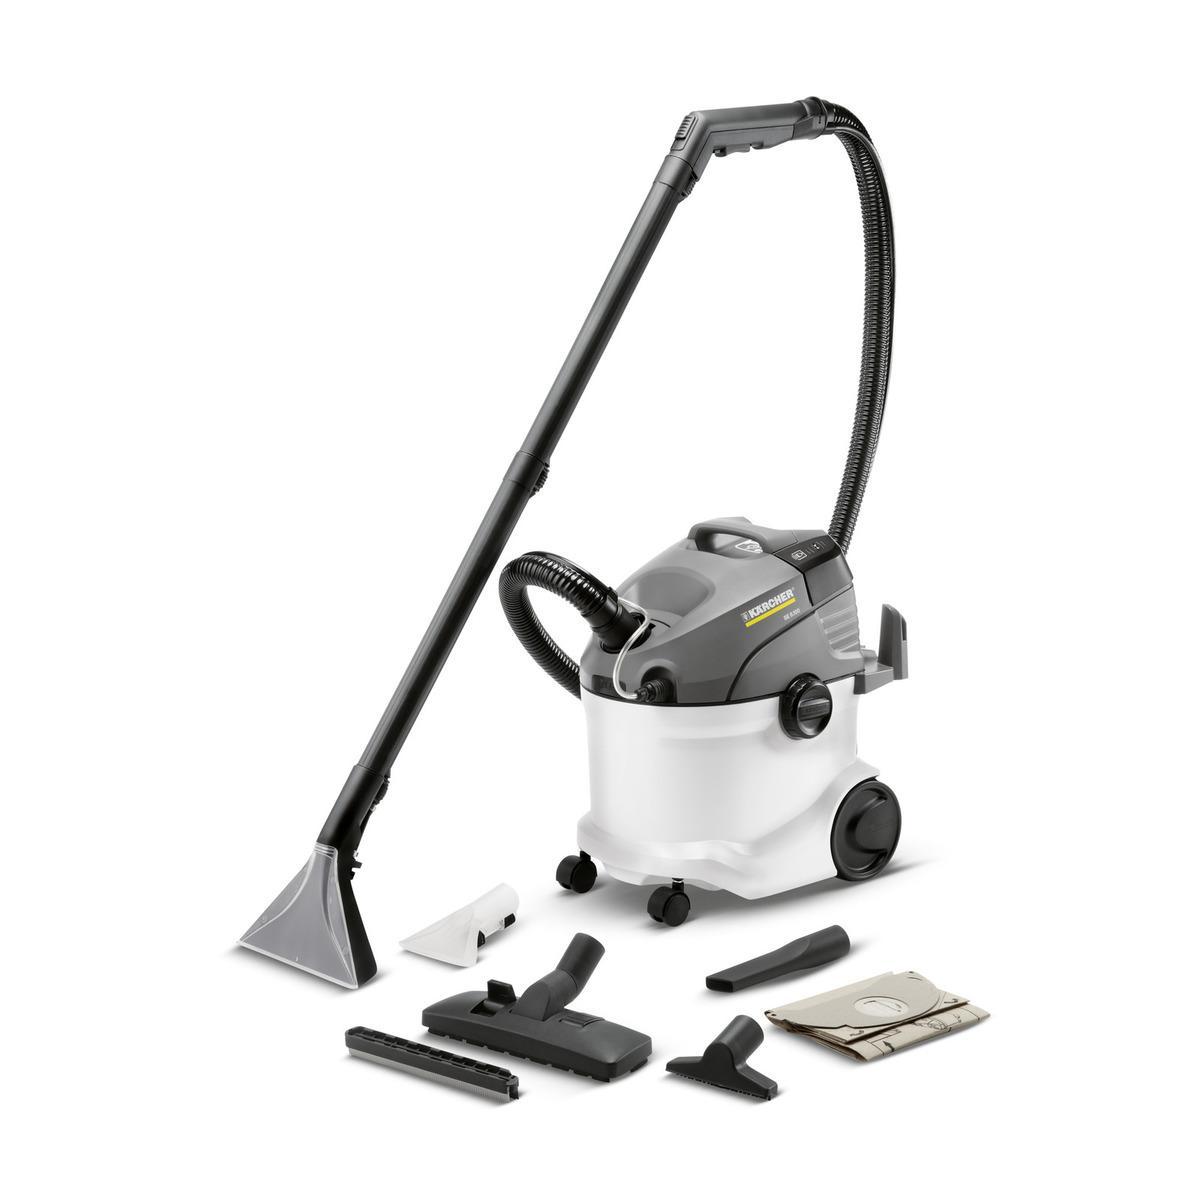 Karcher Carpet Cleaner Se6100 Singapore Wd4 Mv 4 Premium Vacuum Wet And Dry